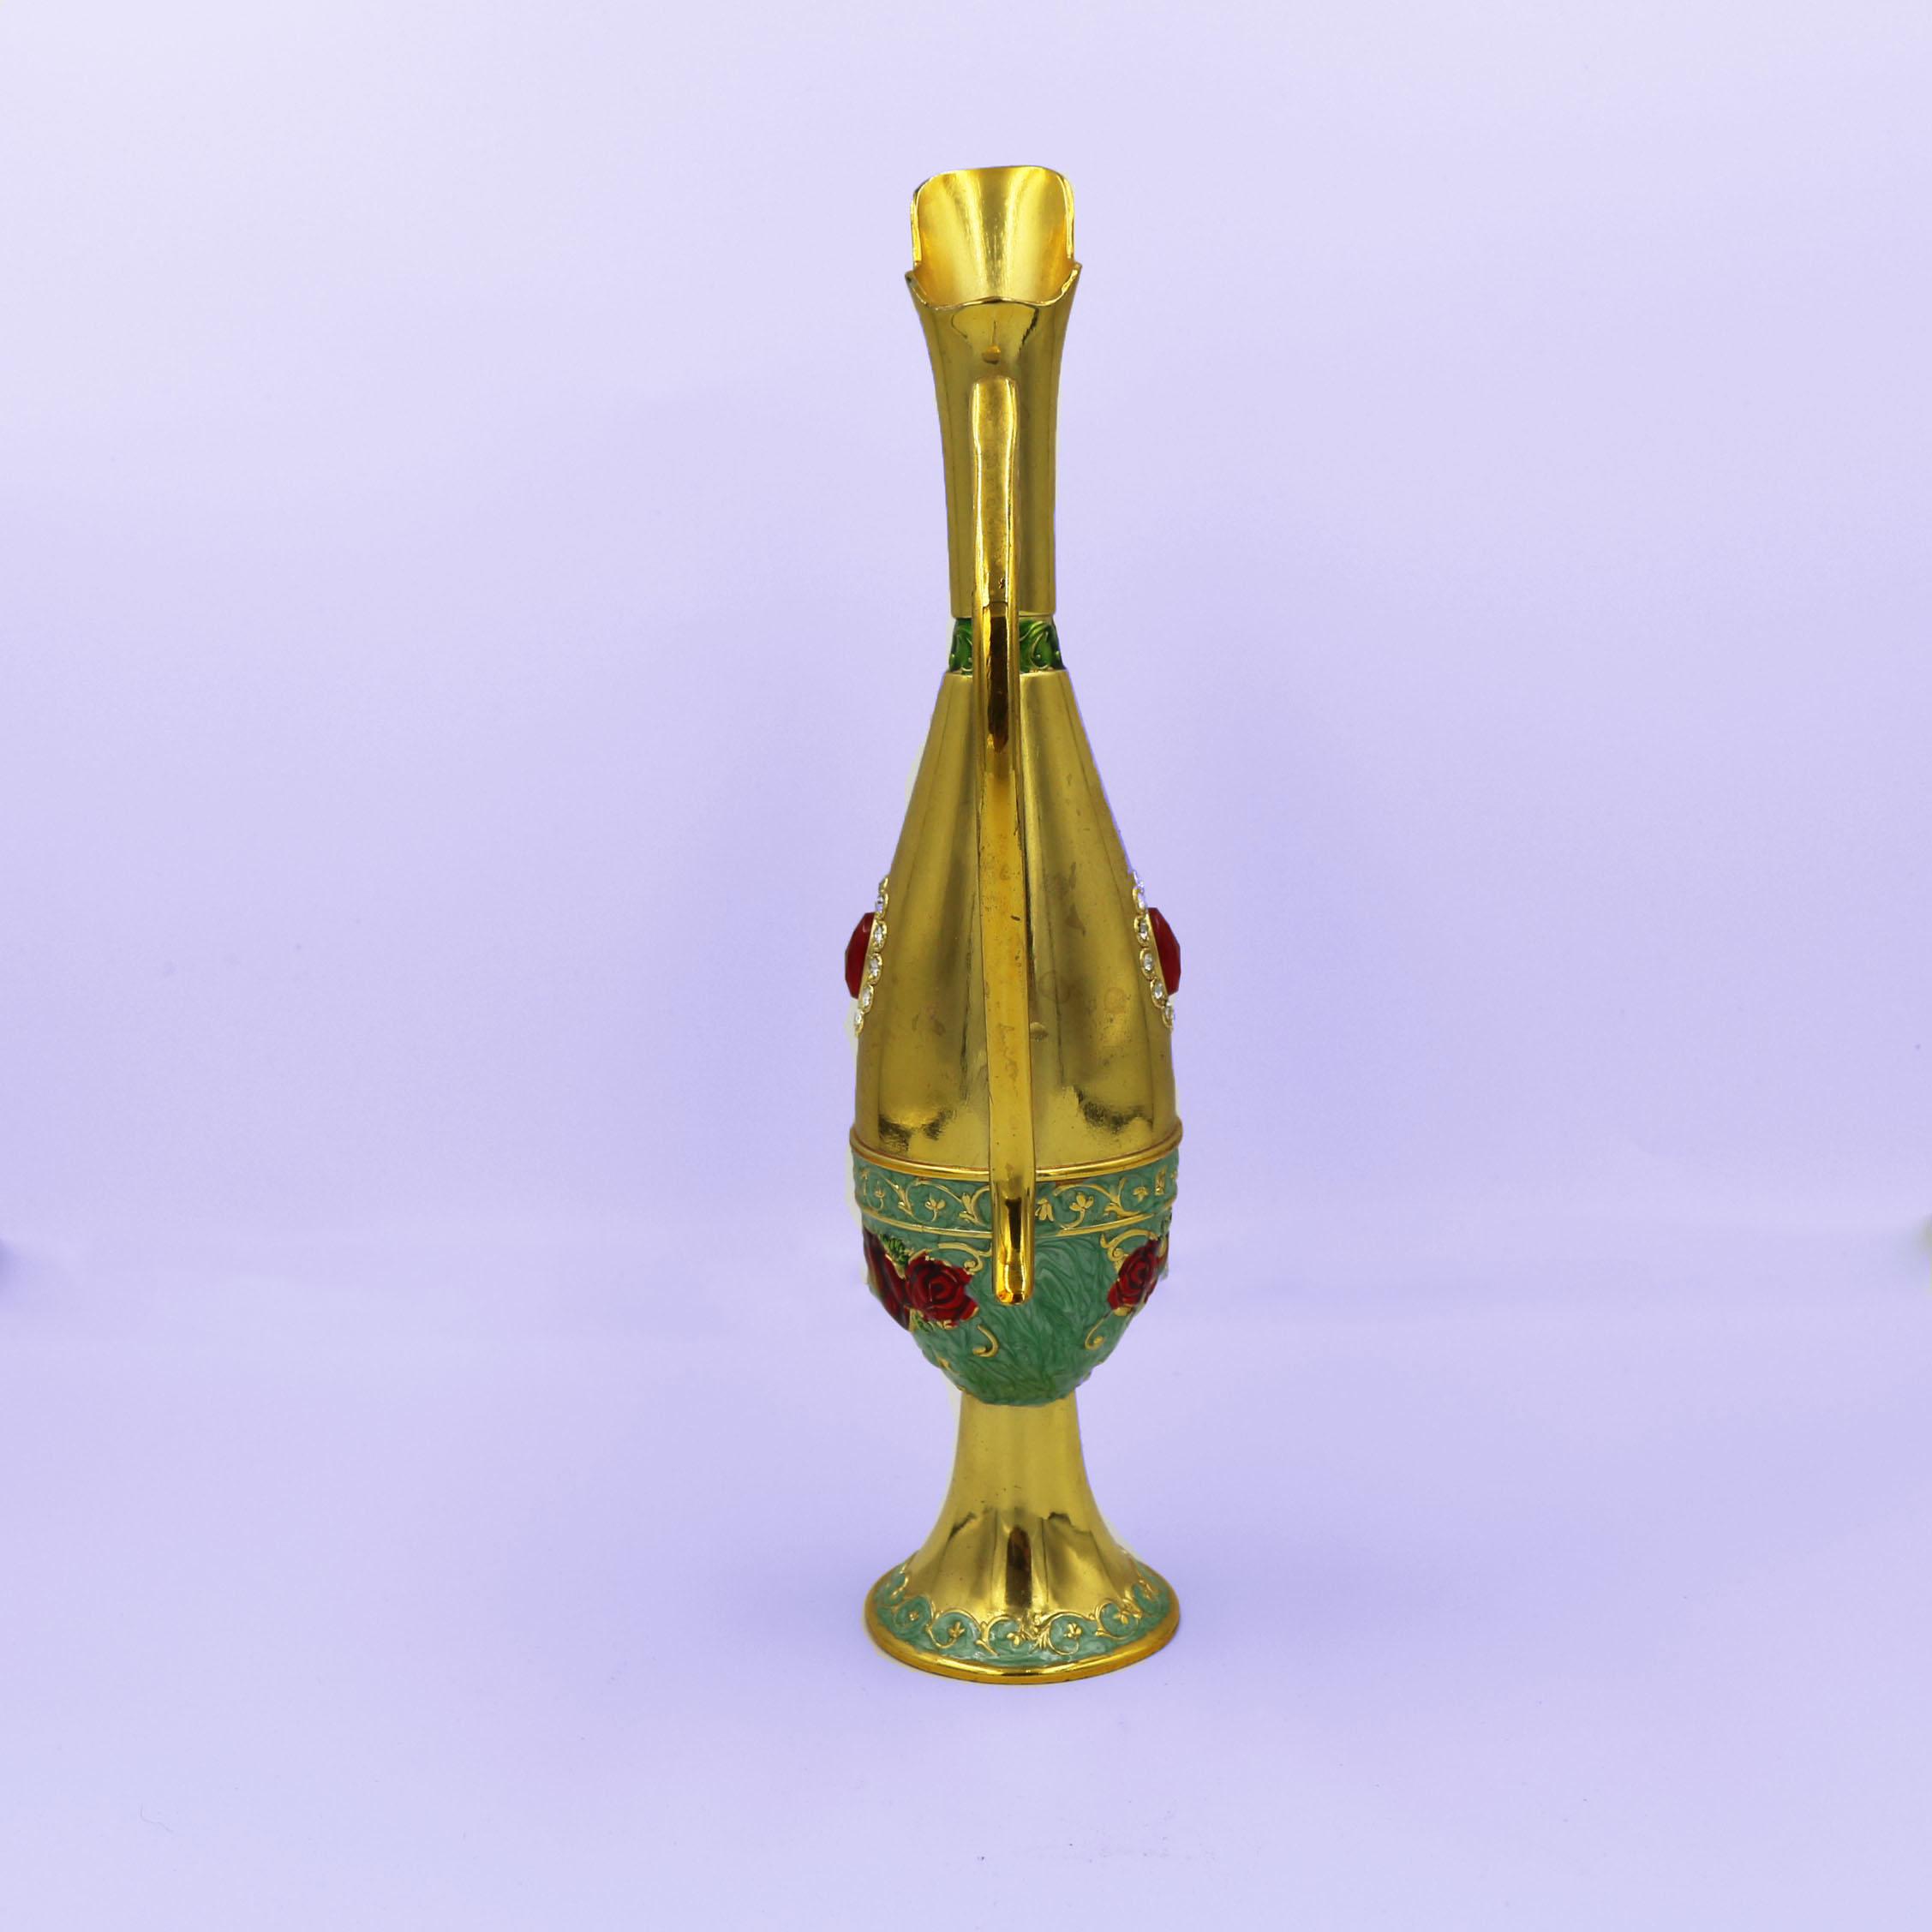 Xinglin European retro crafts ornaments supplier for present-4